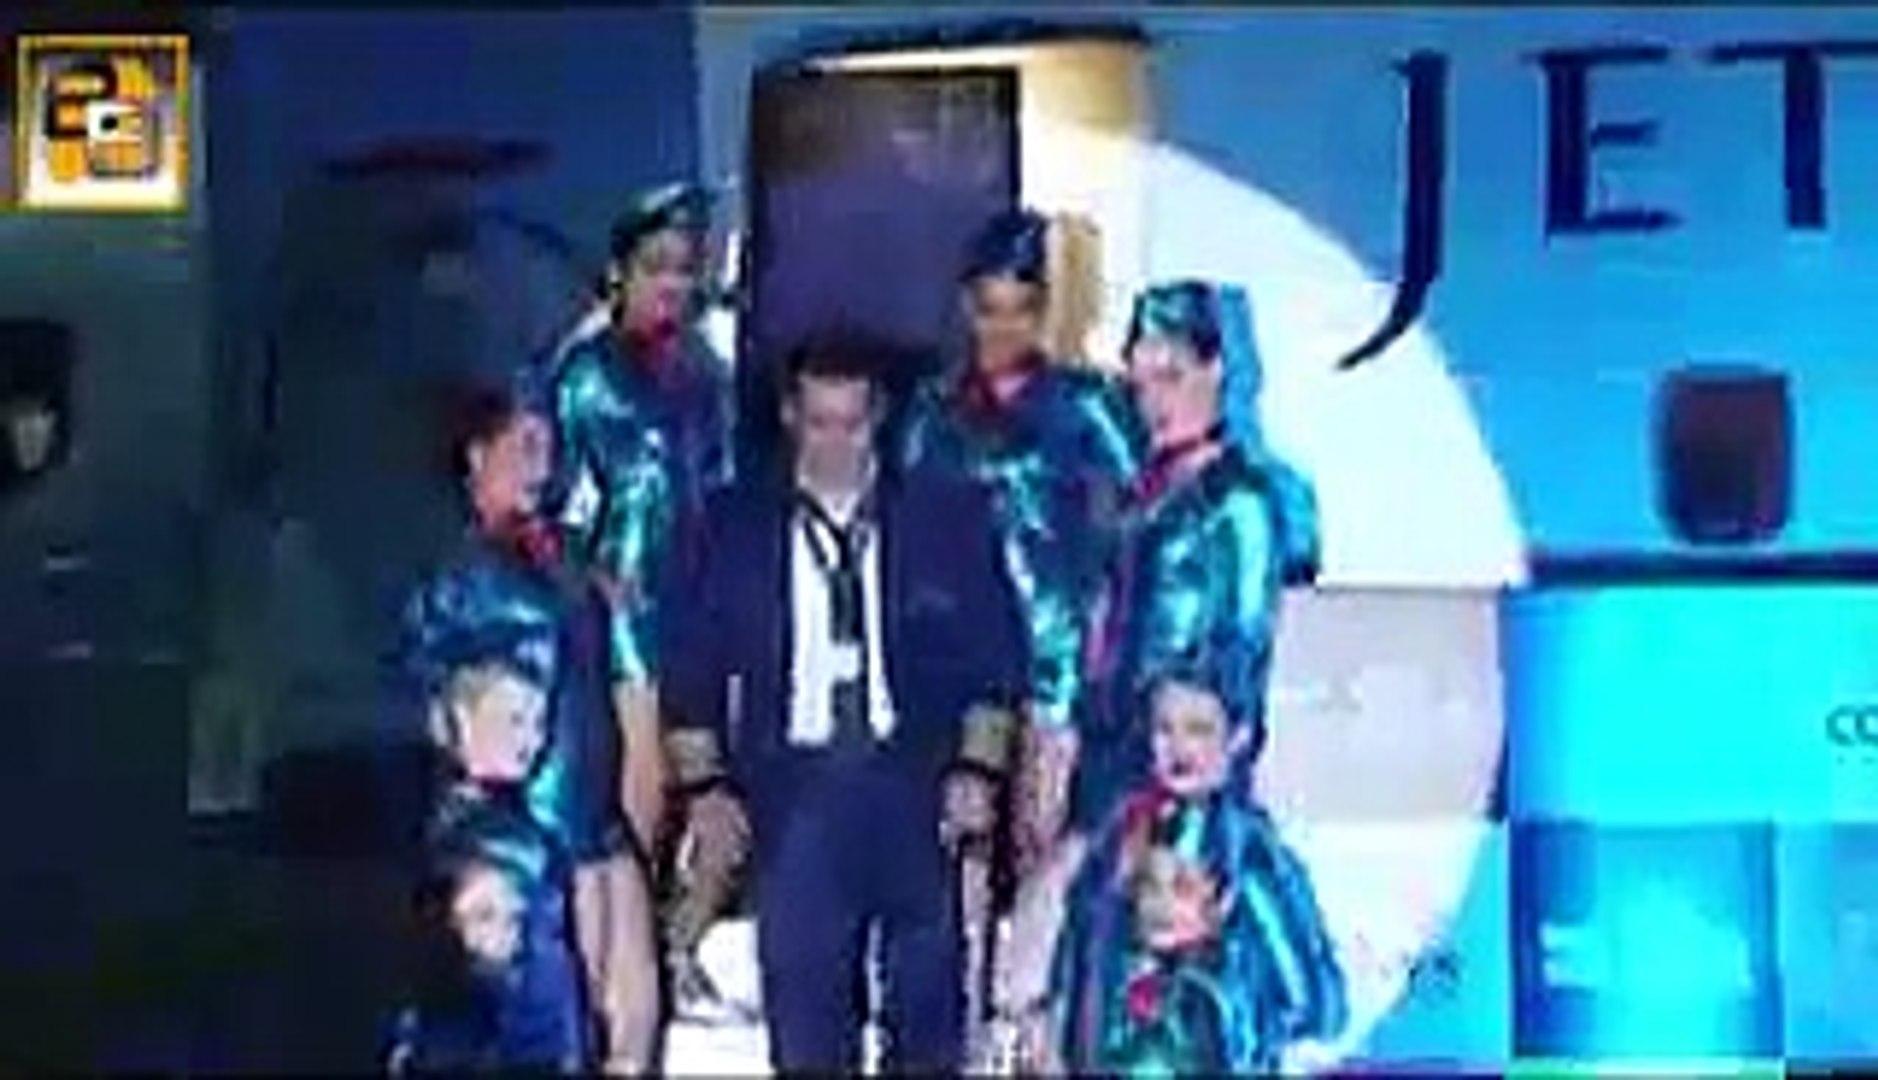 Hot videos D12  Bigg Boss 8 15th October 2014 Episode 24   Karishma Tanna EMOTIONAL BLACKMAIL BY m1